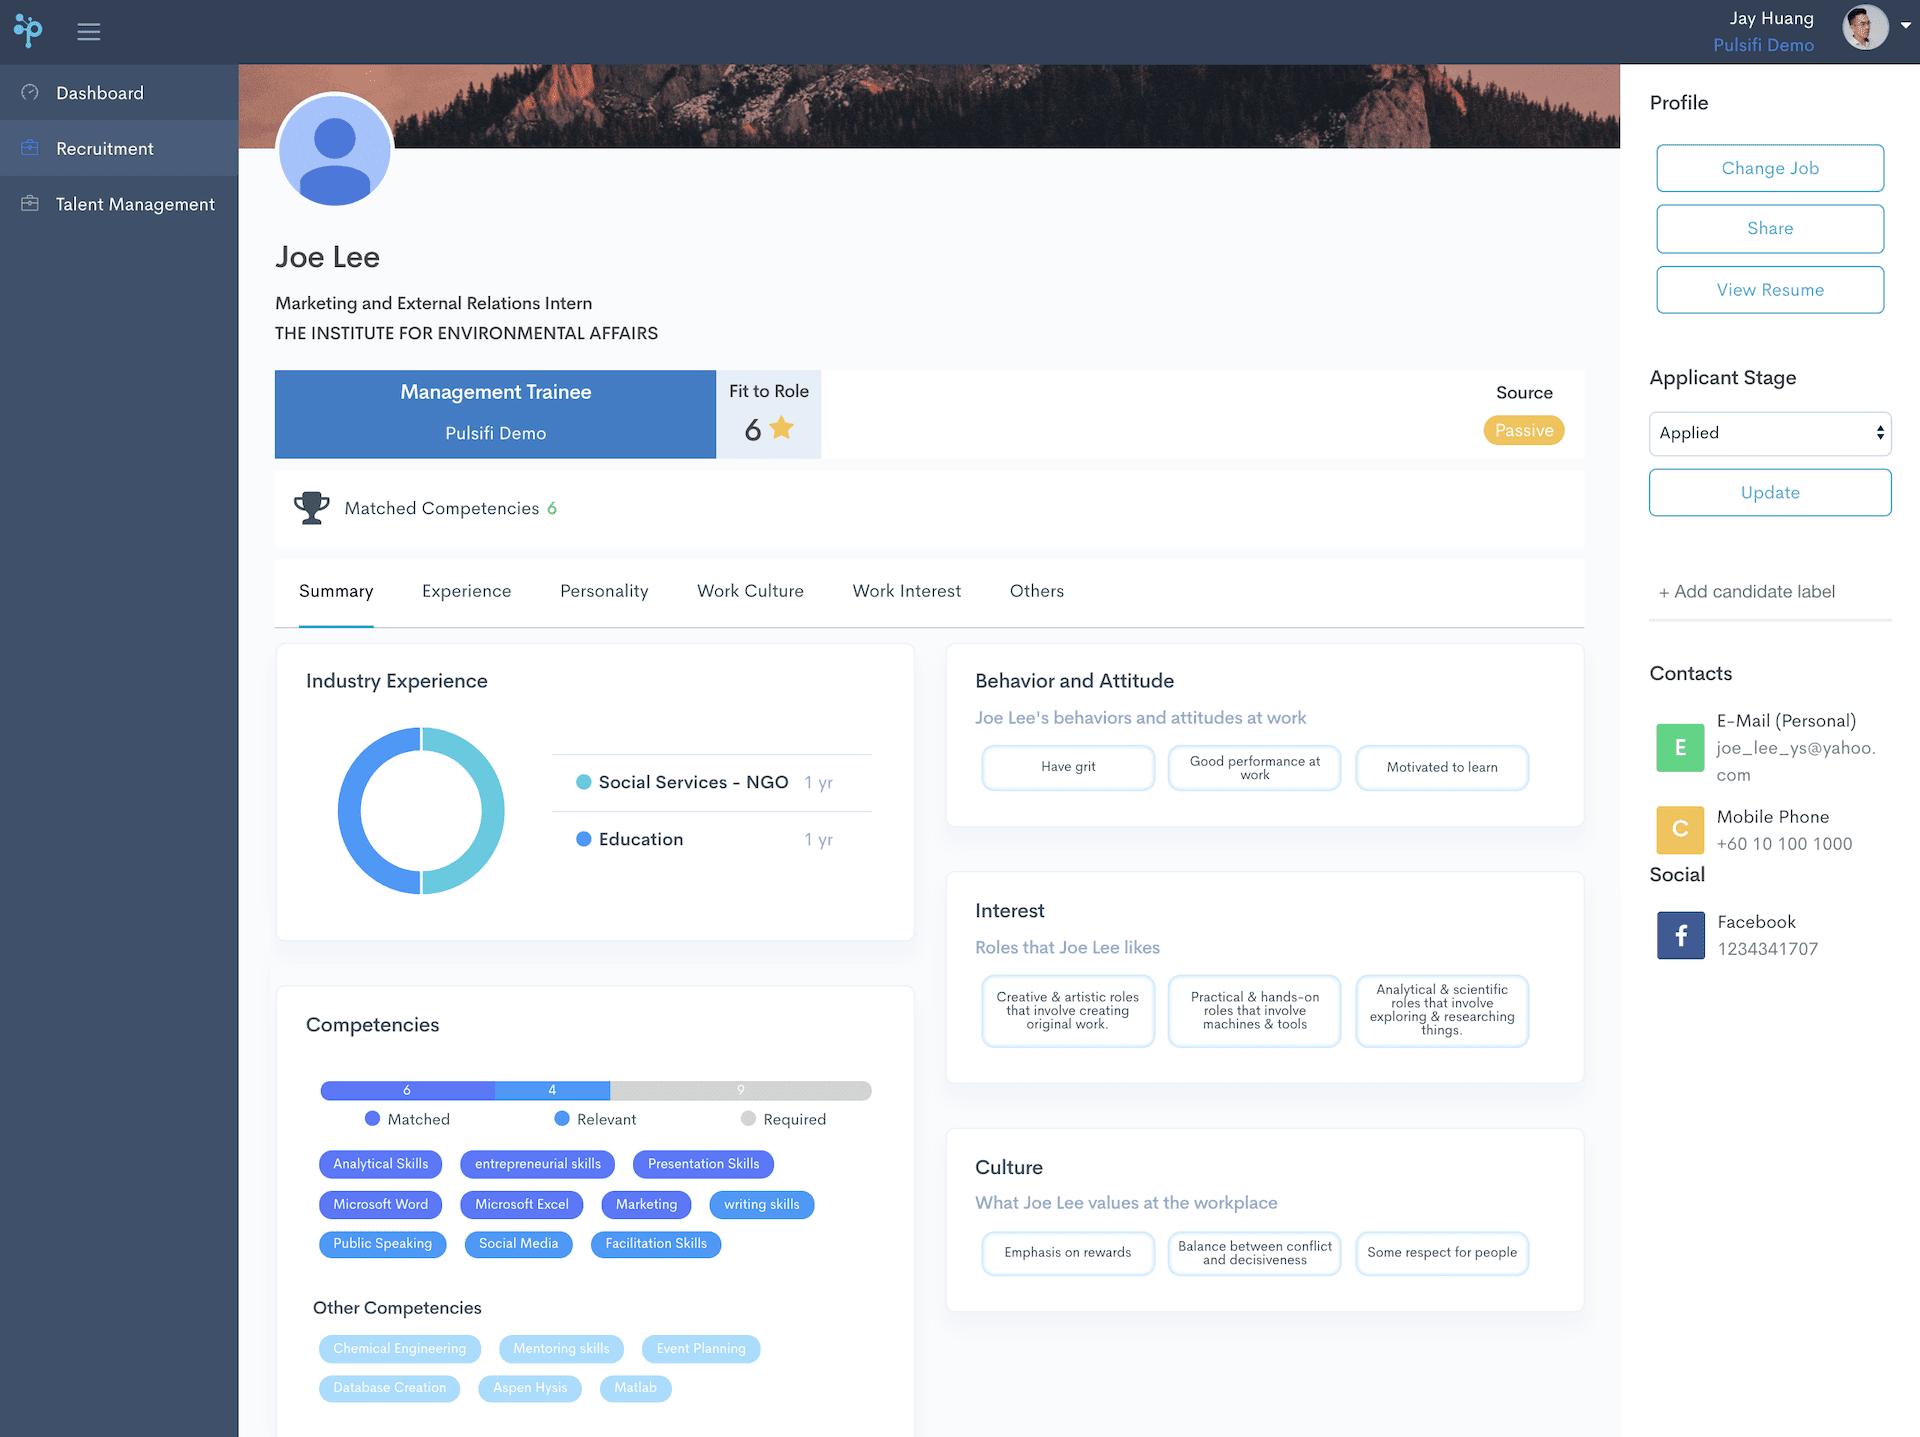 Pulsifi software profile screenshot